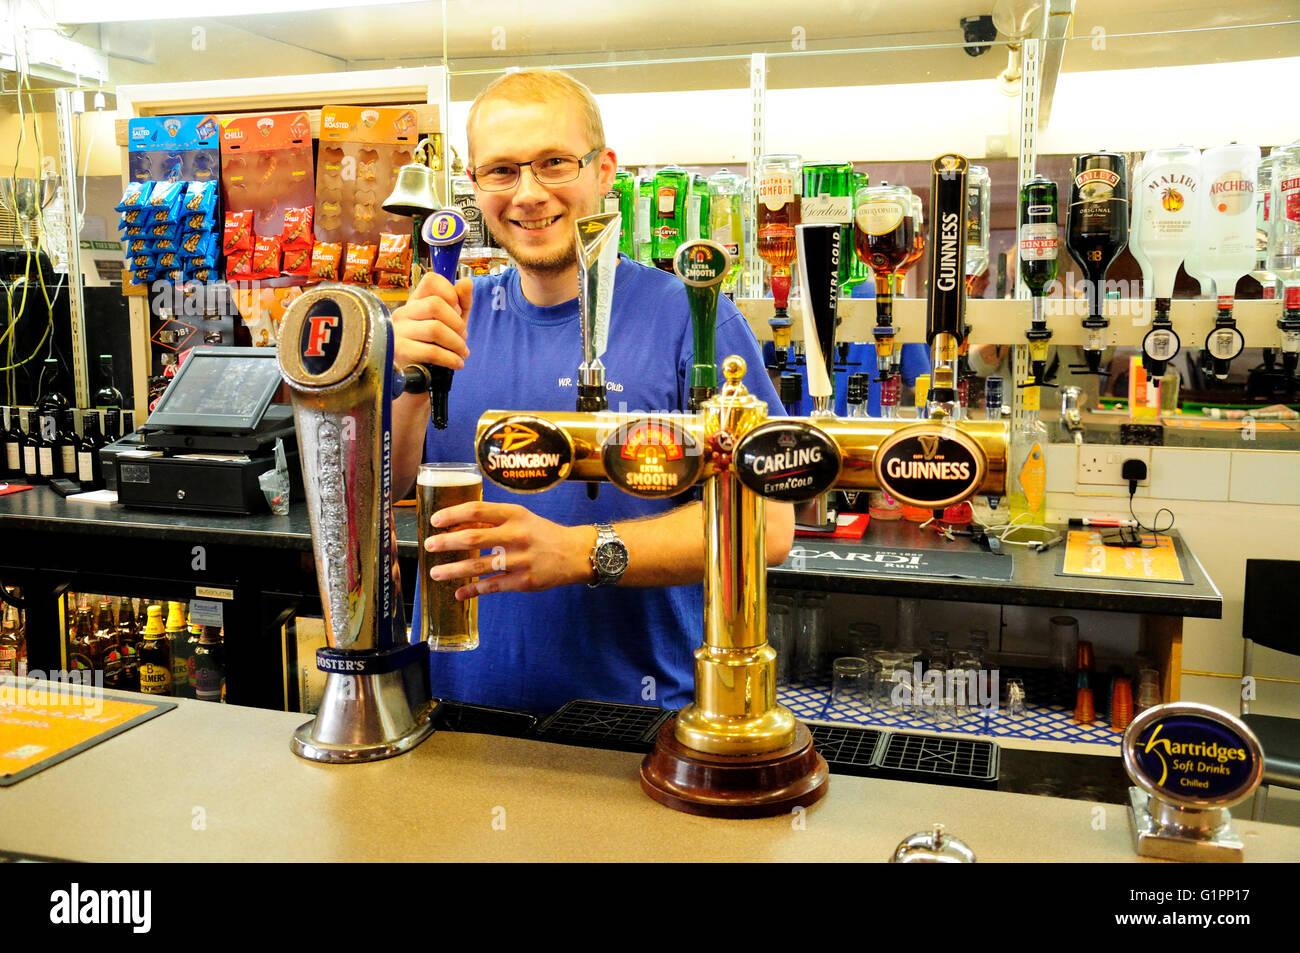 Barman serving beer at bar, WR Sports Club, Woodthorpe Road, Ashford, Surrey, England, United Kingdom - Stock Image